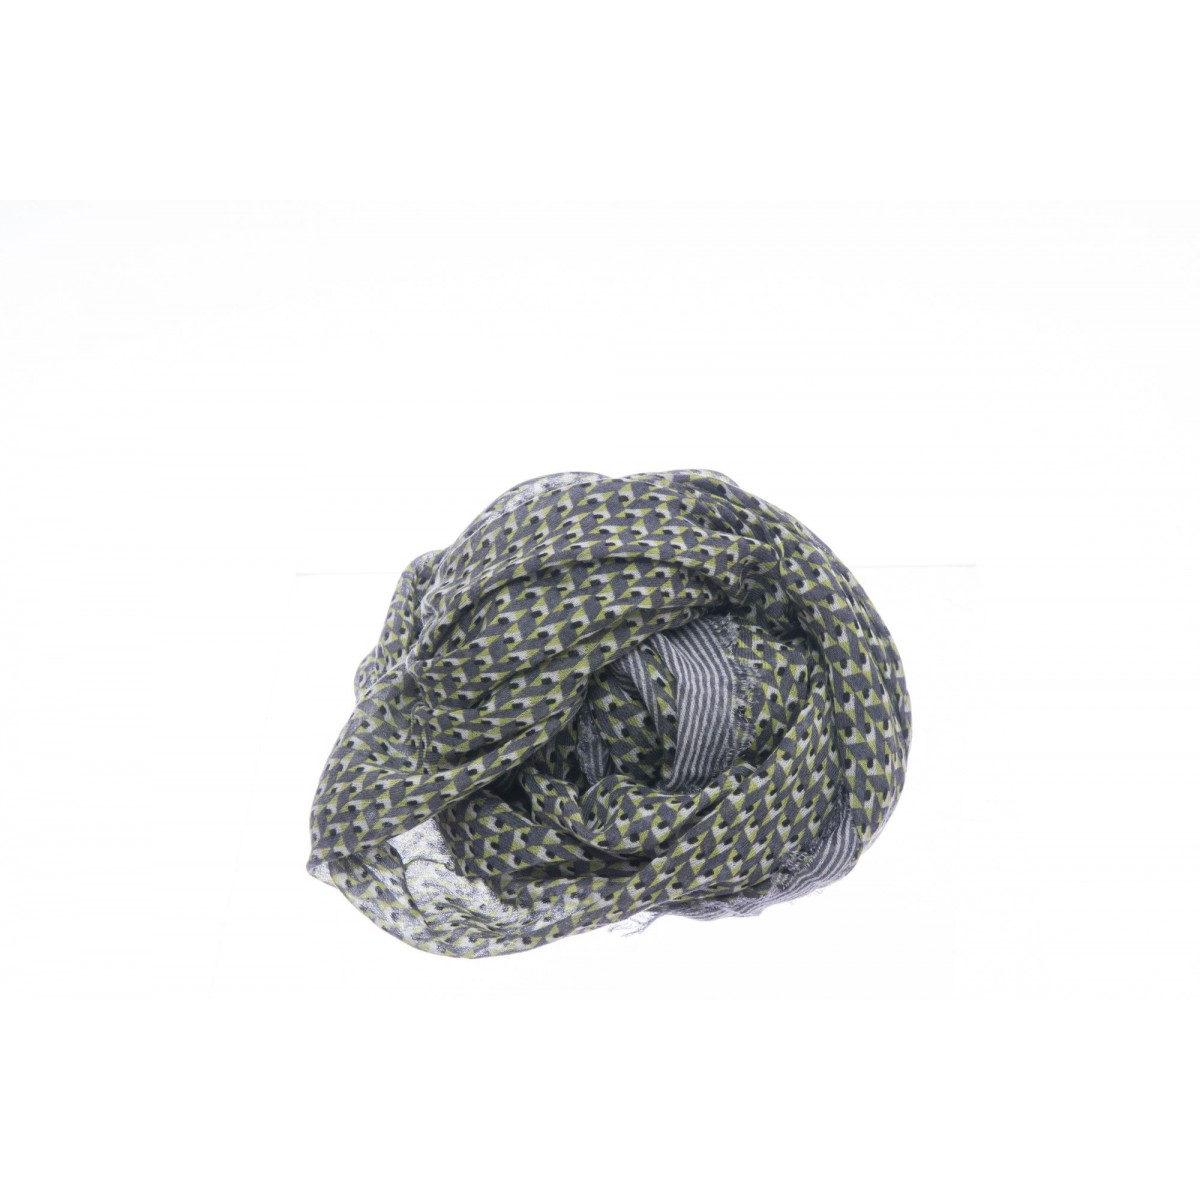 Sciarpa Camerucci - 402 eye sciapra 85% lana 15% seta